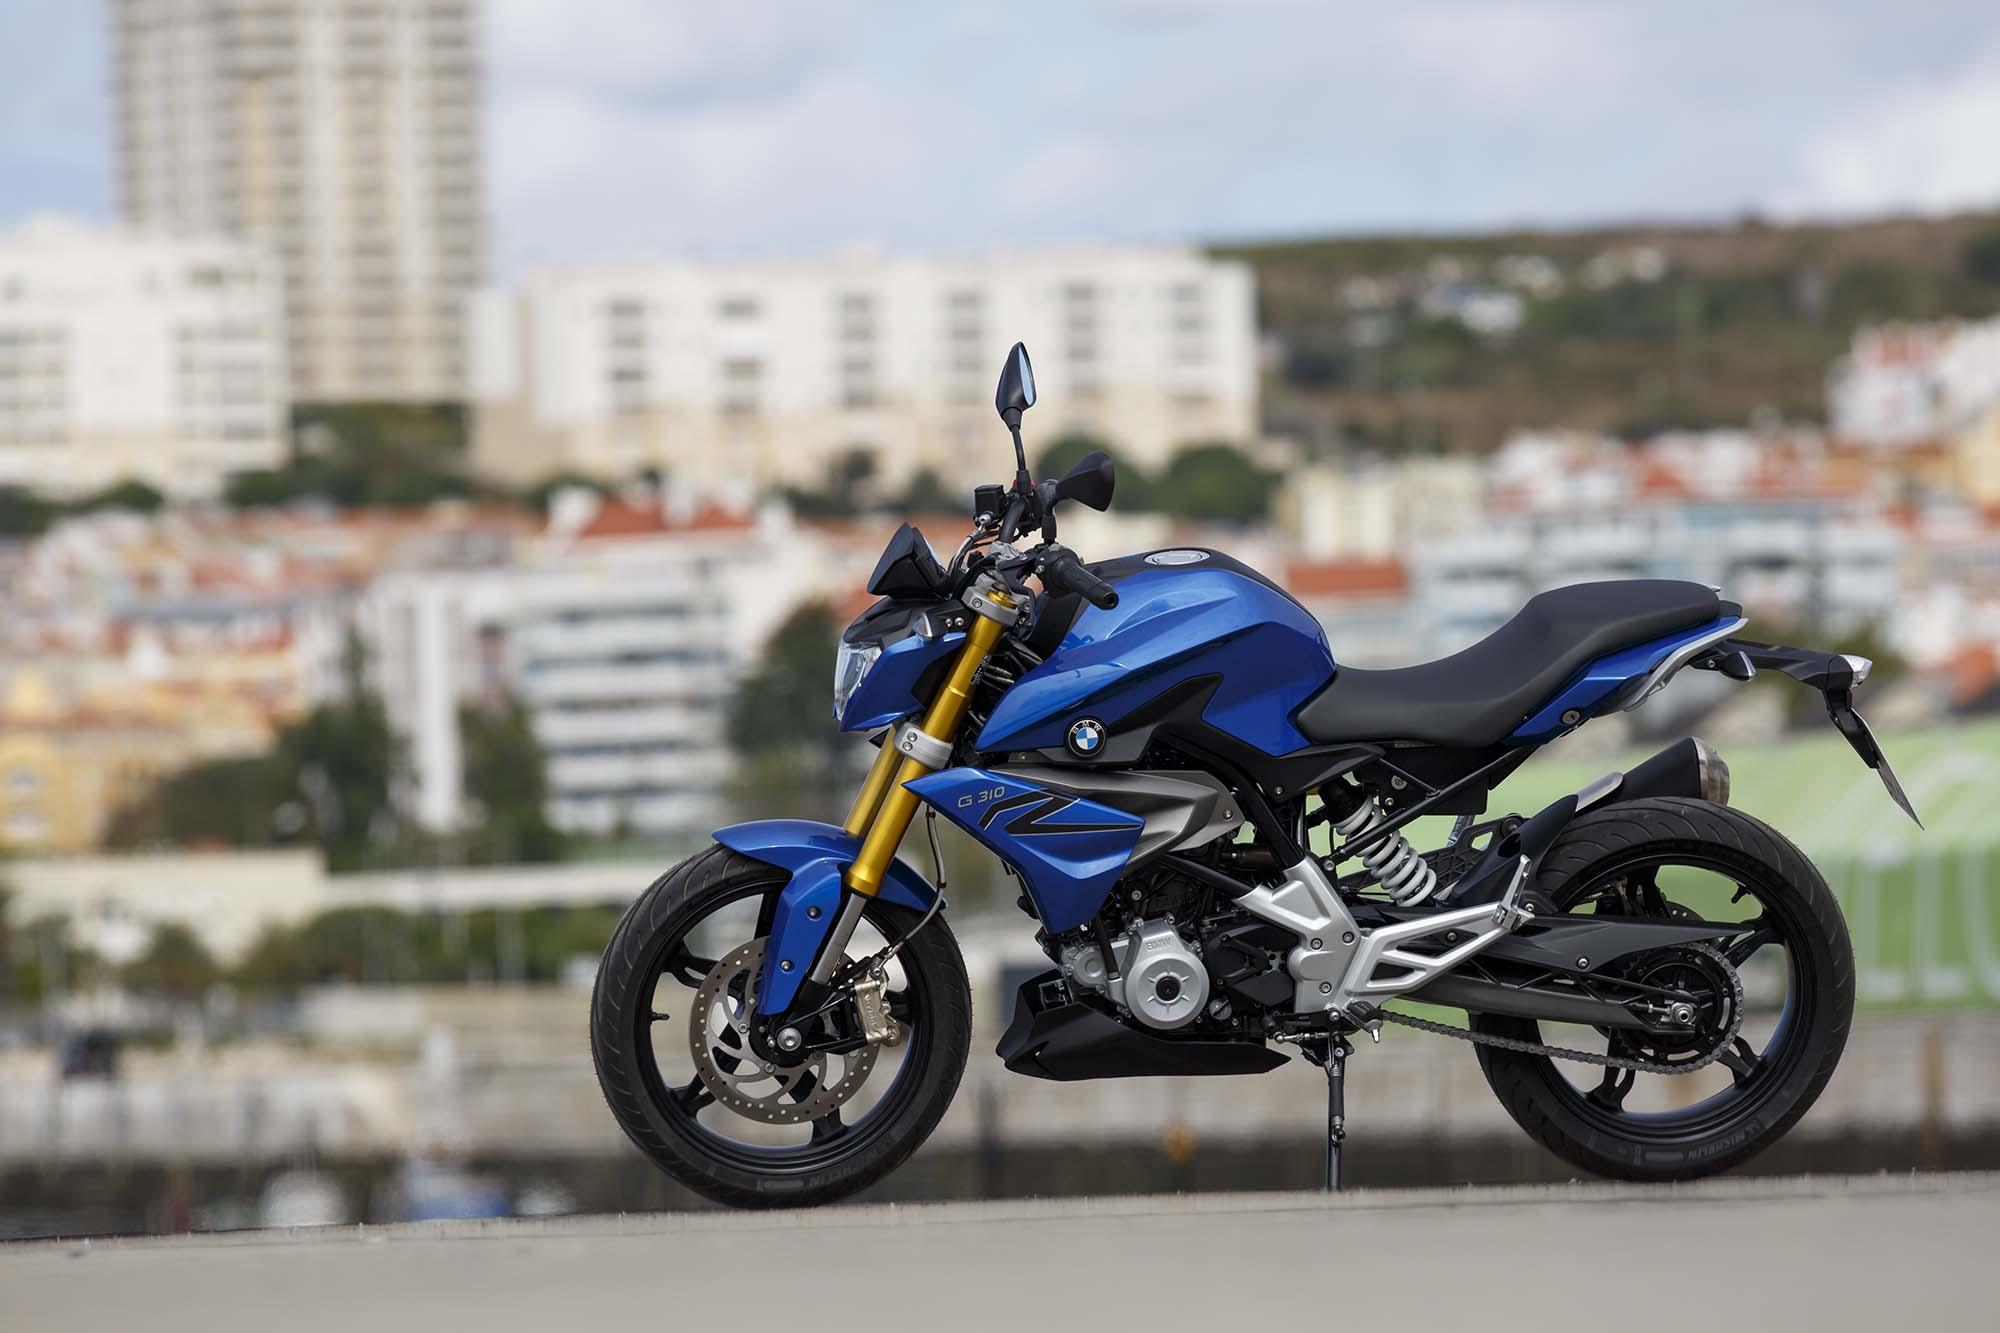 BMW G 310 R 2017 - купить мотоцикл БМВ G 310 R 2017 в ...